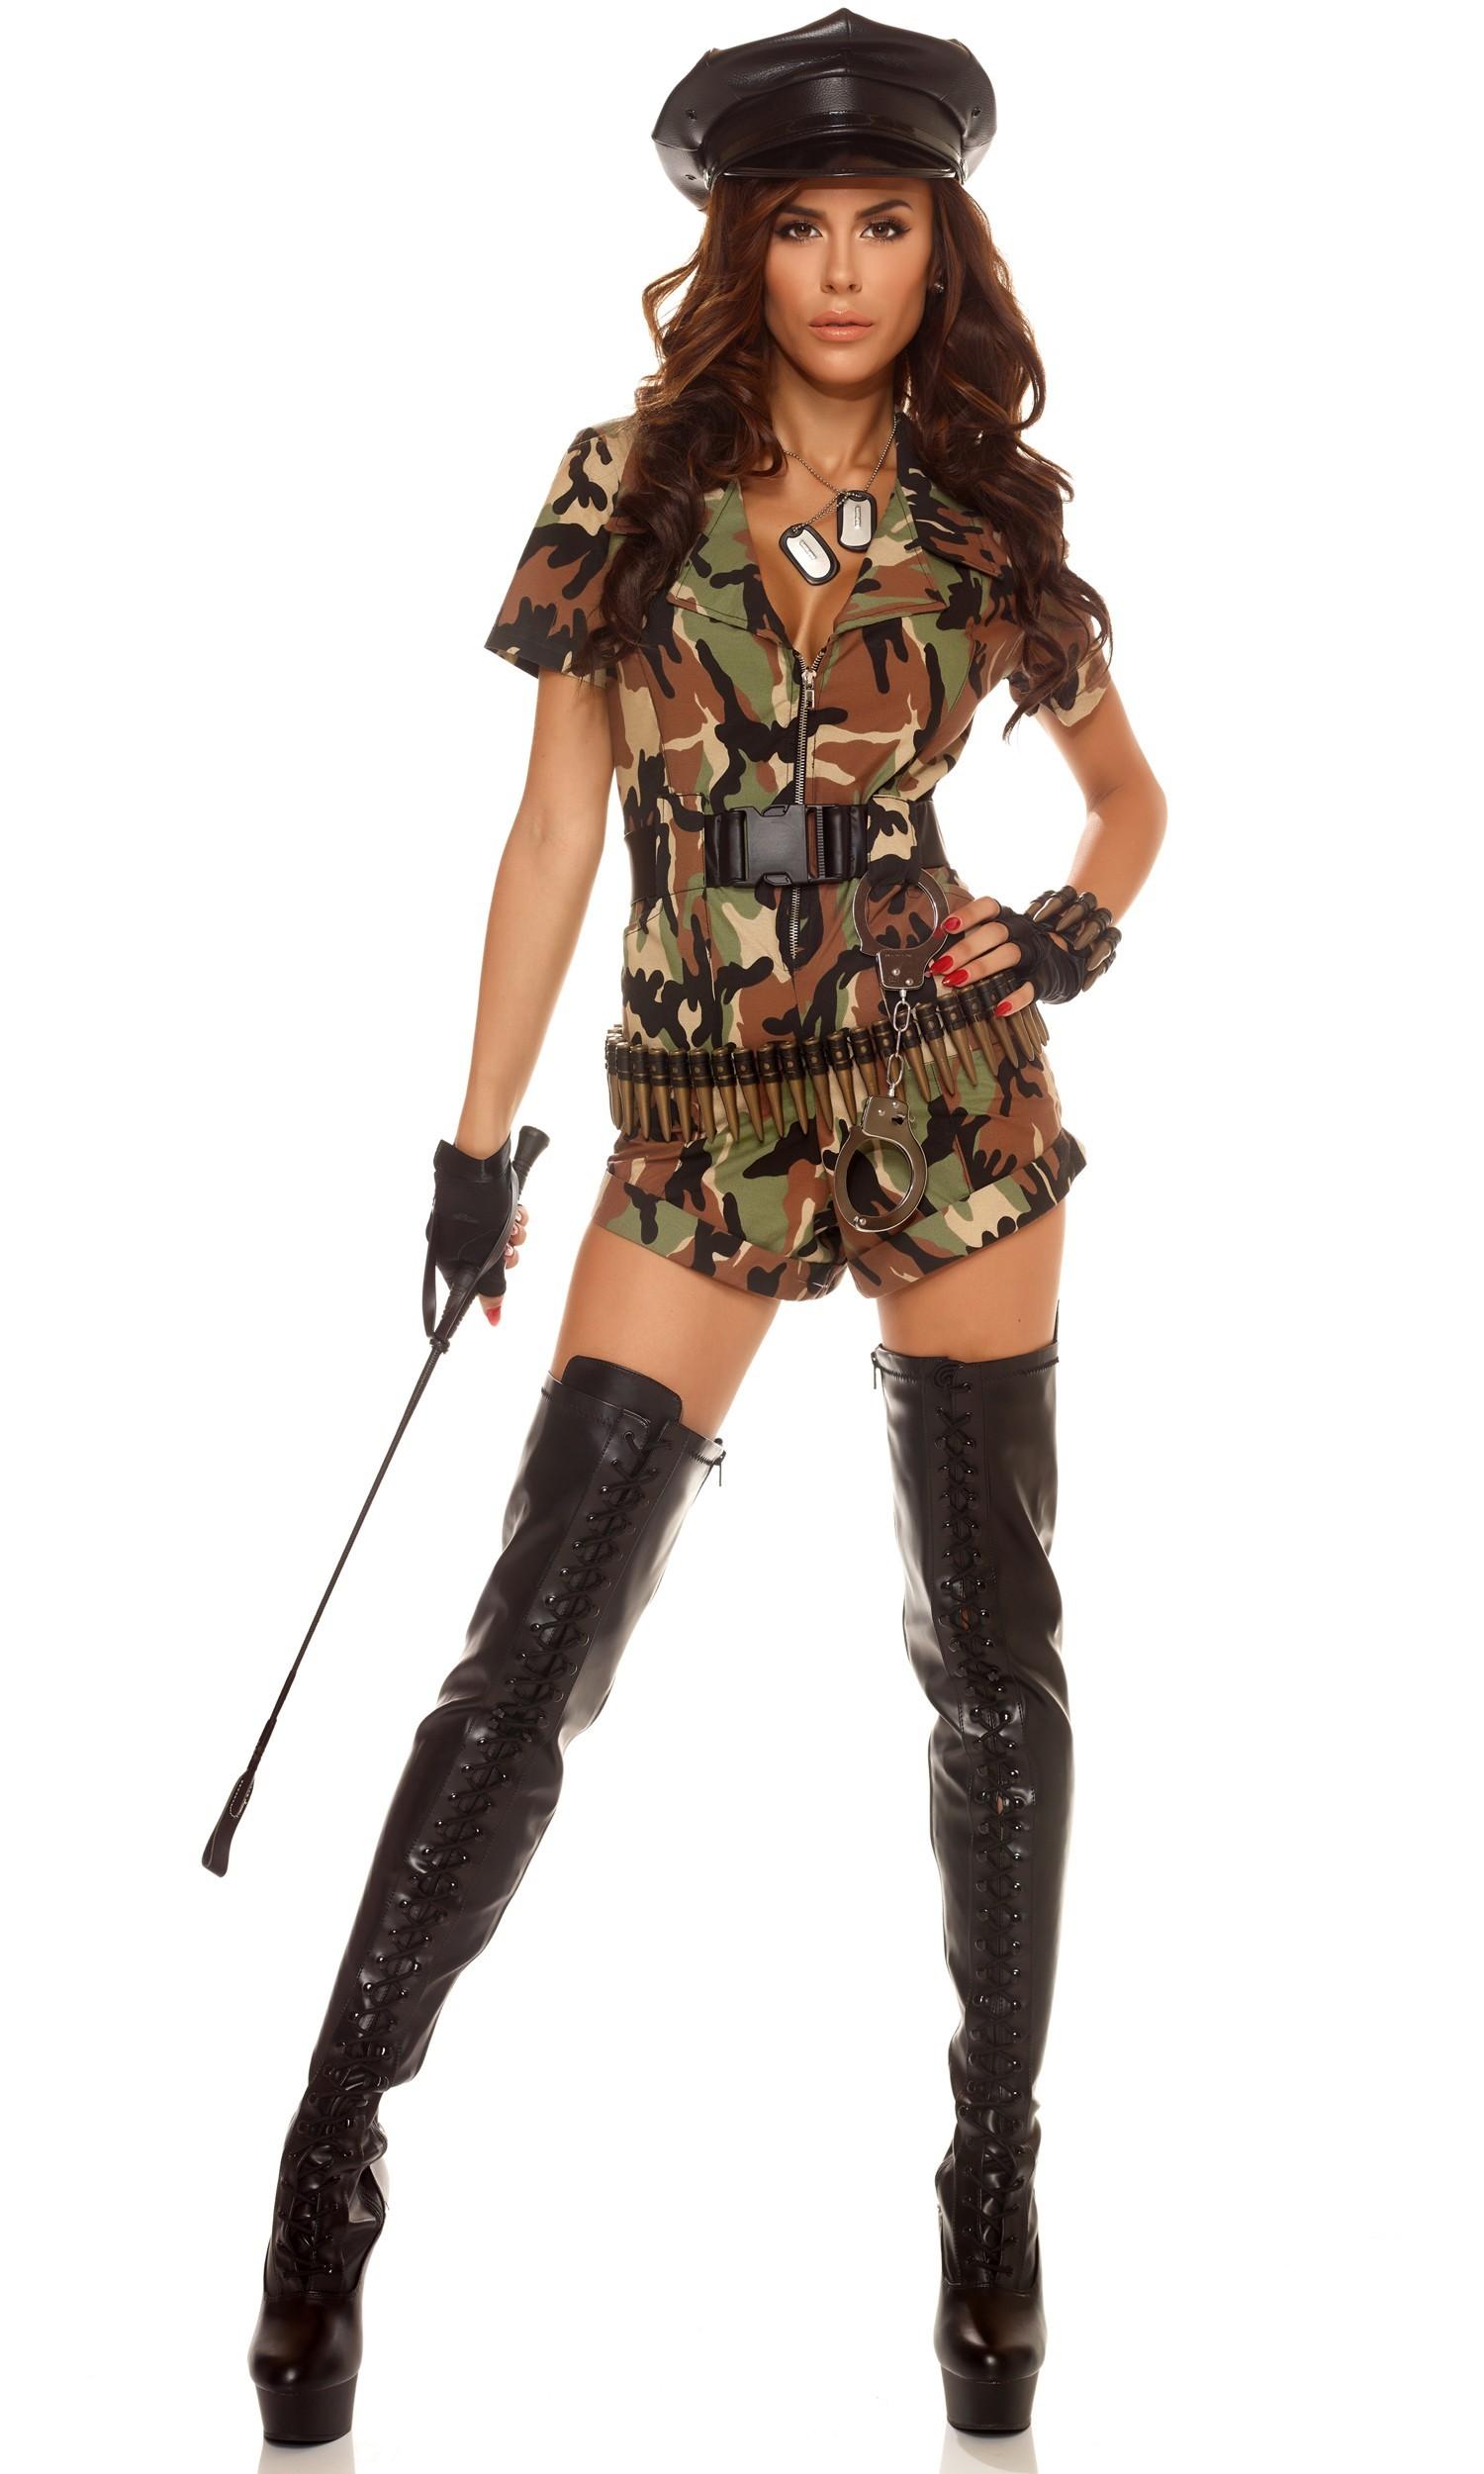 War Ready 3pc Sexy Army Costume